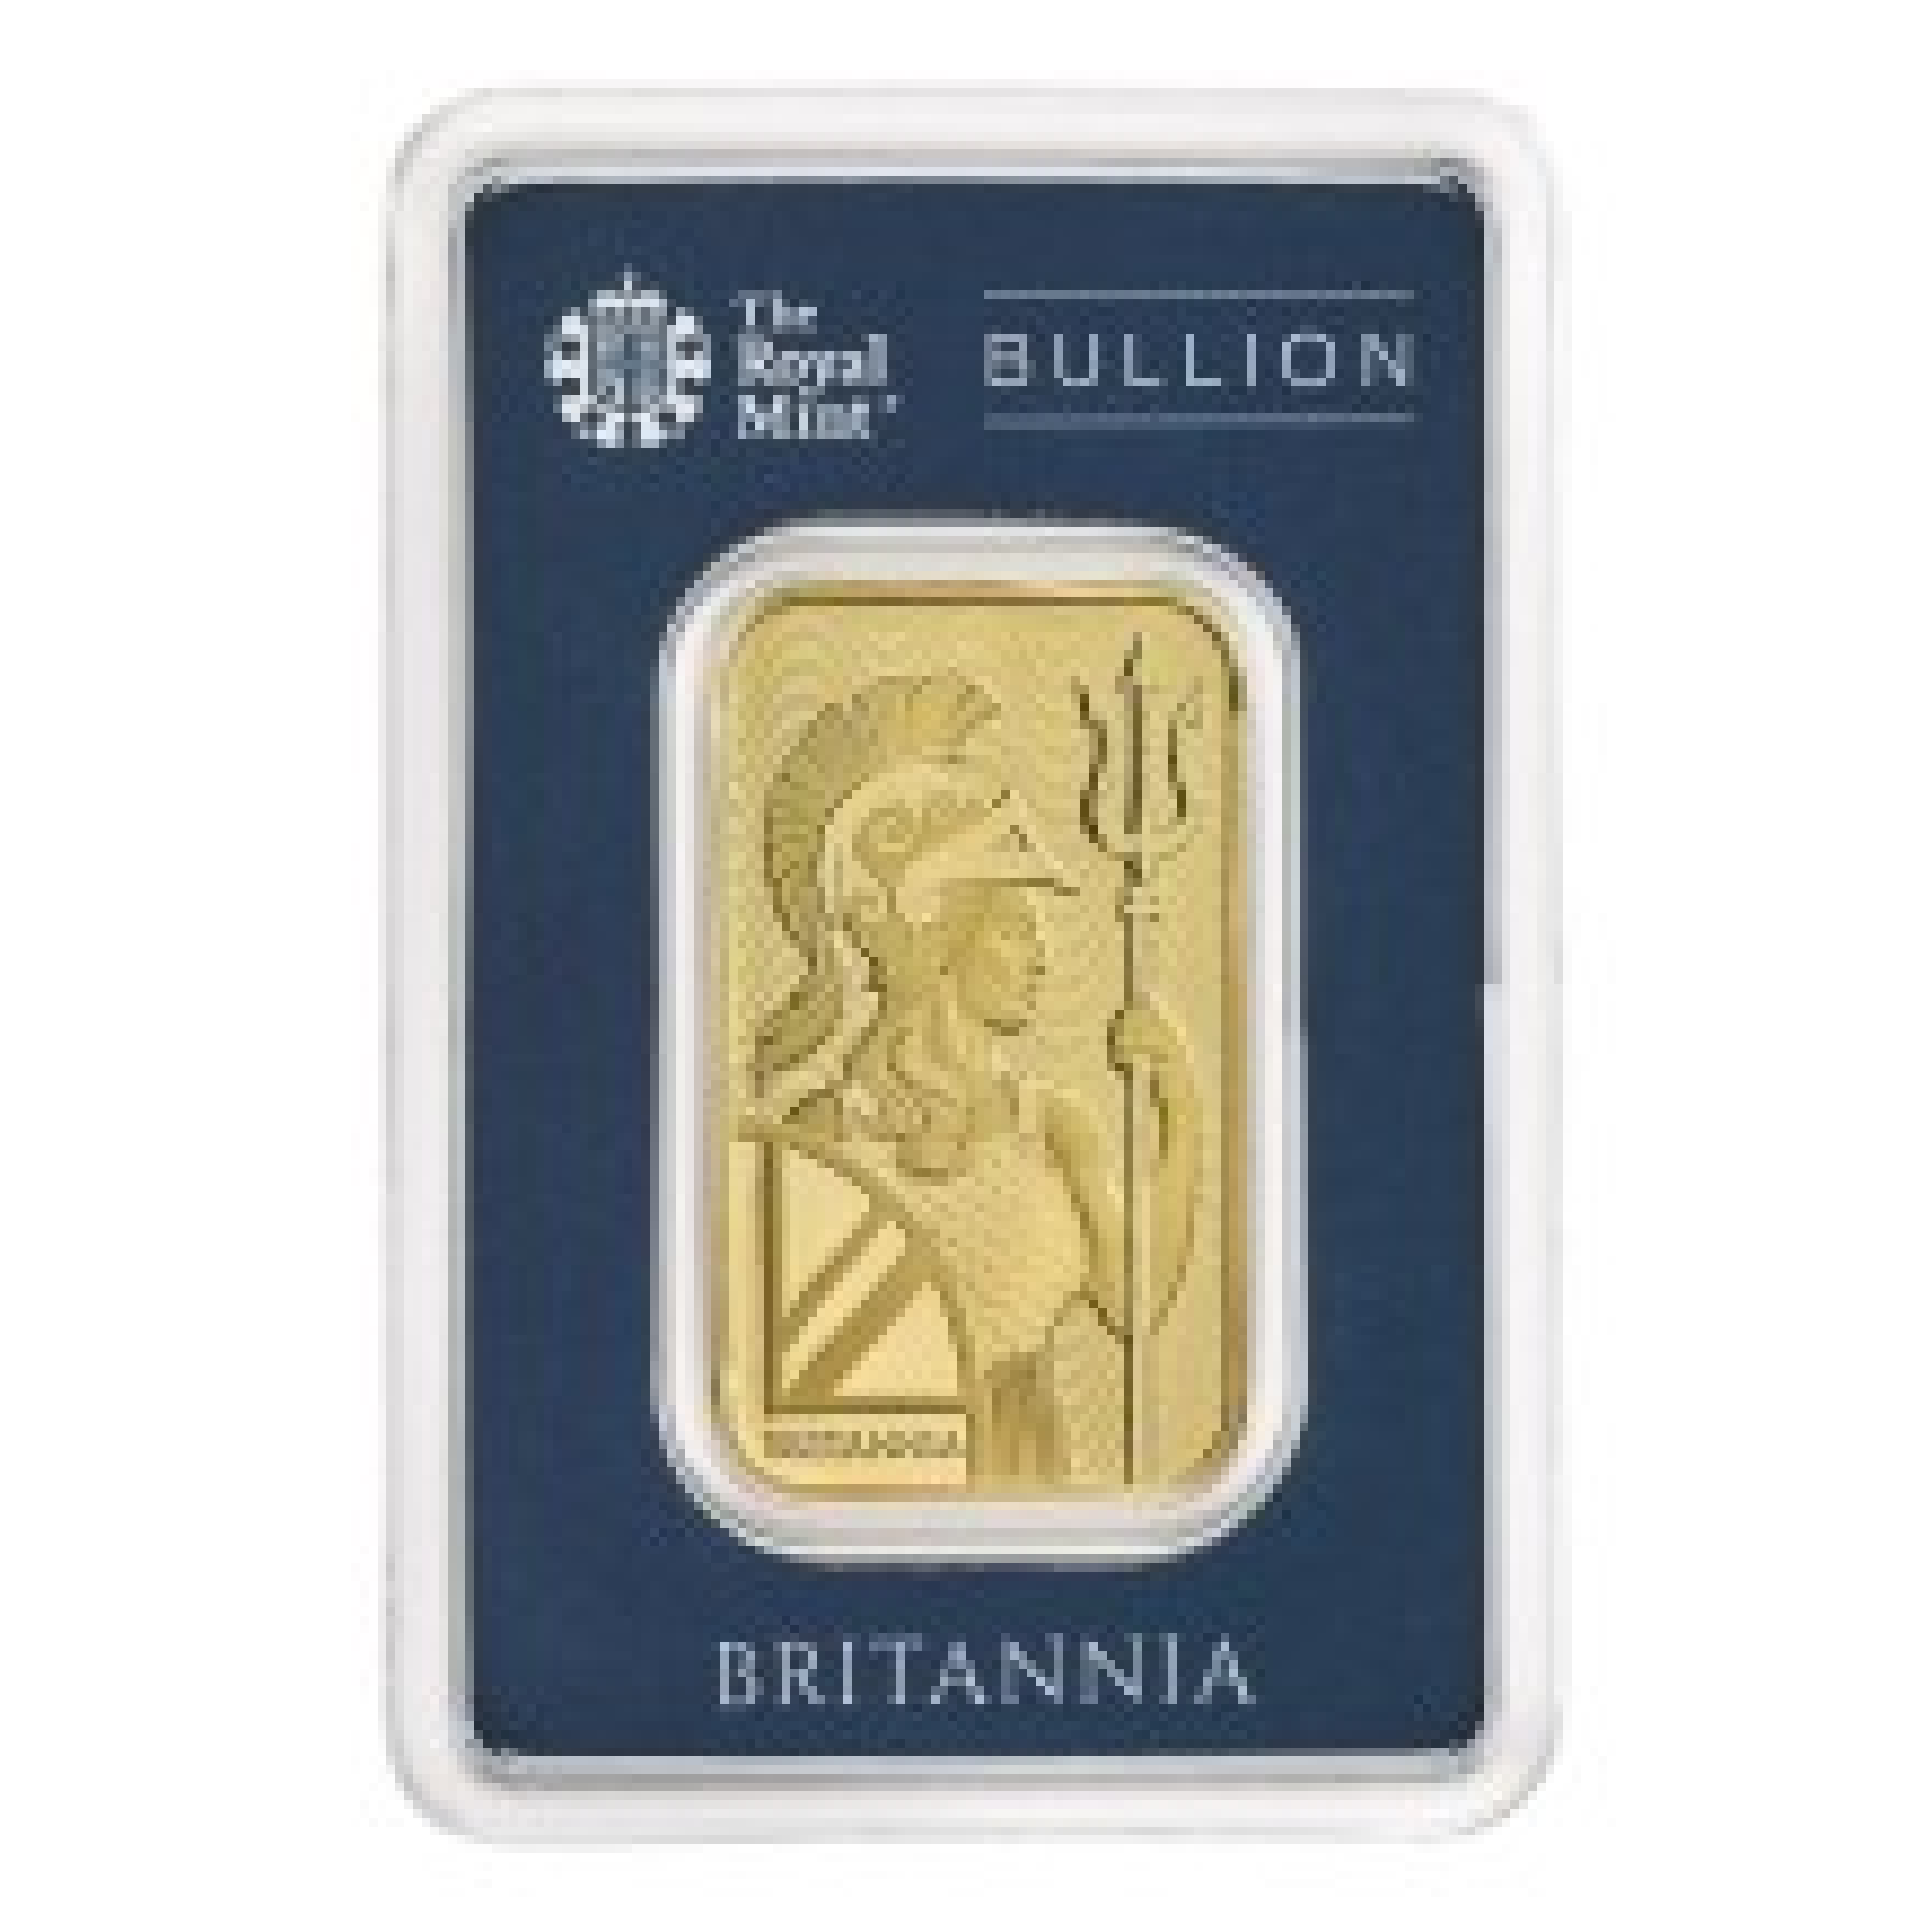 Gold bar 1 troy ounce Britannia Royal Mint